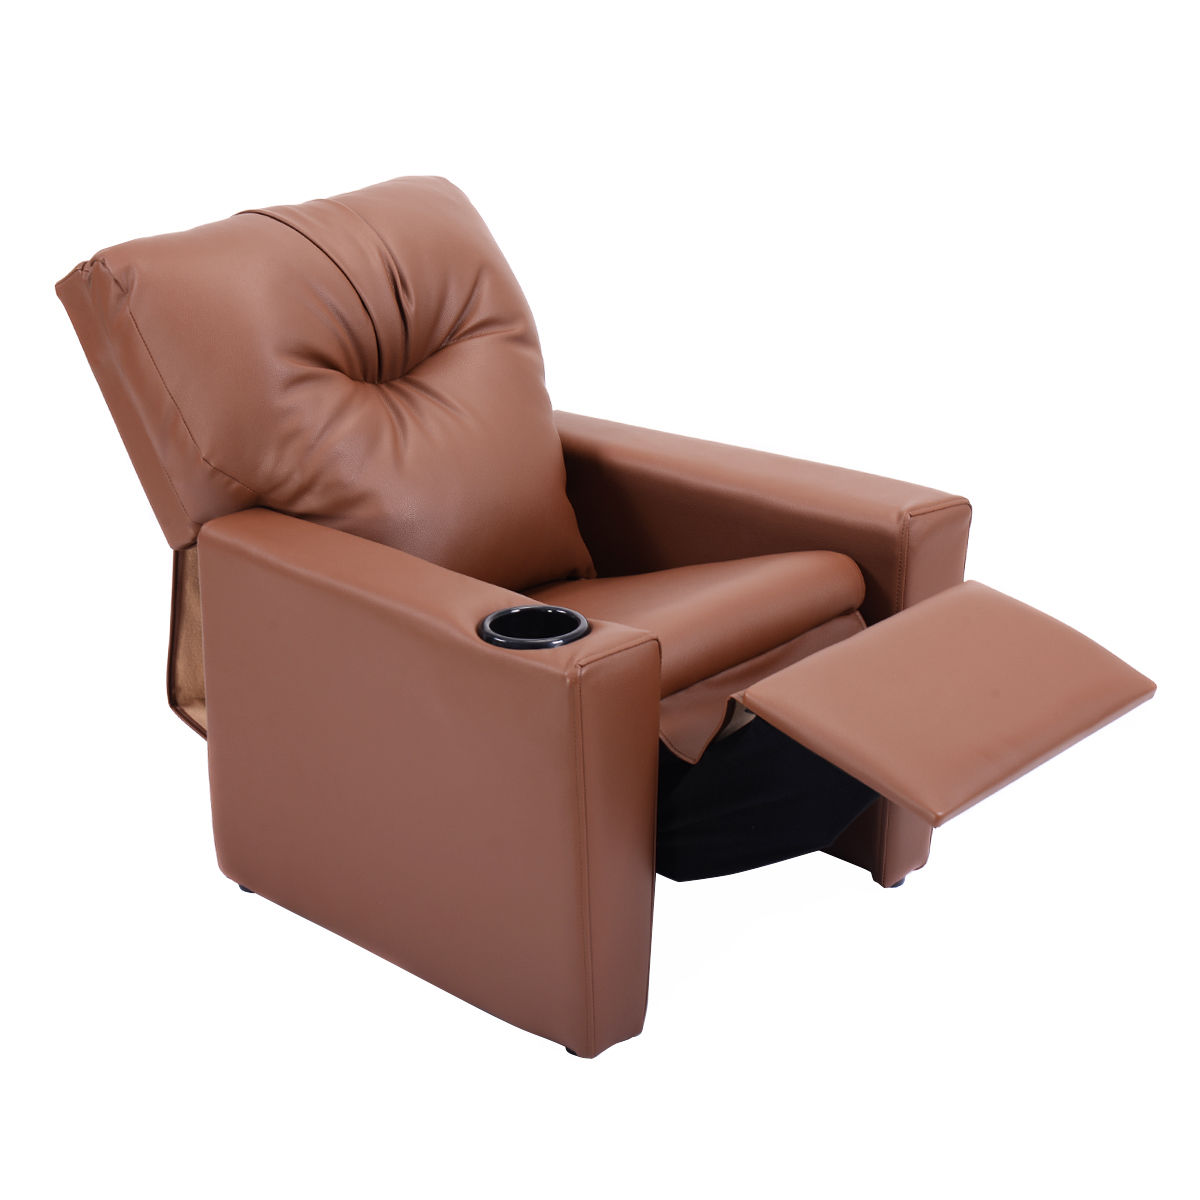 Giantex Kids Sofa Manual Recliner Pu Leather Ergonomic Lounge With Cup Holder Children Gift Modern Children Furniture HW54197BN